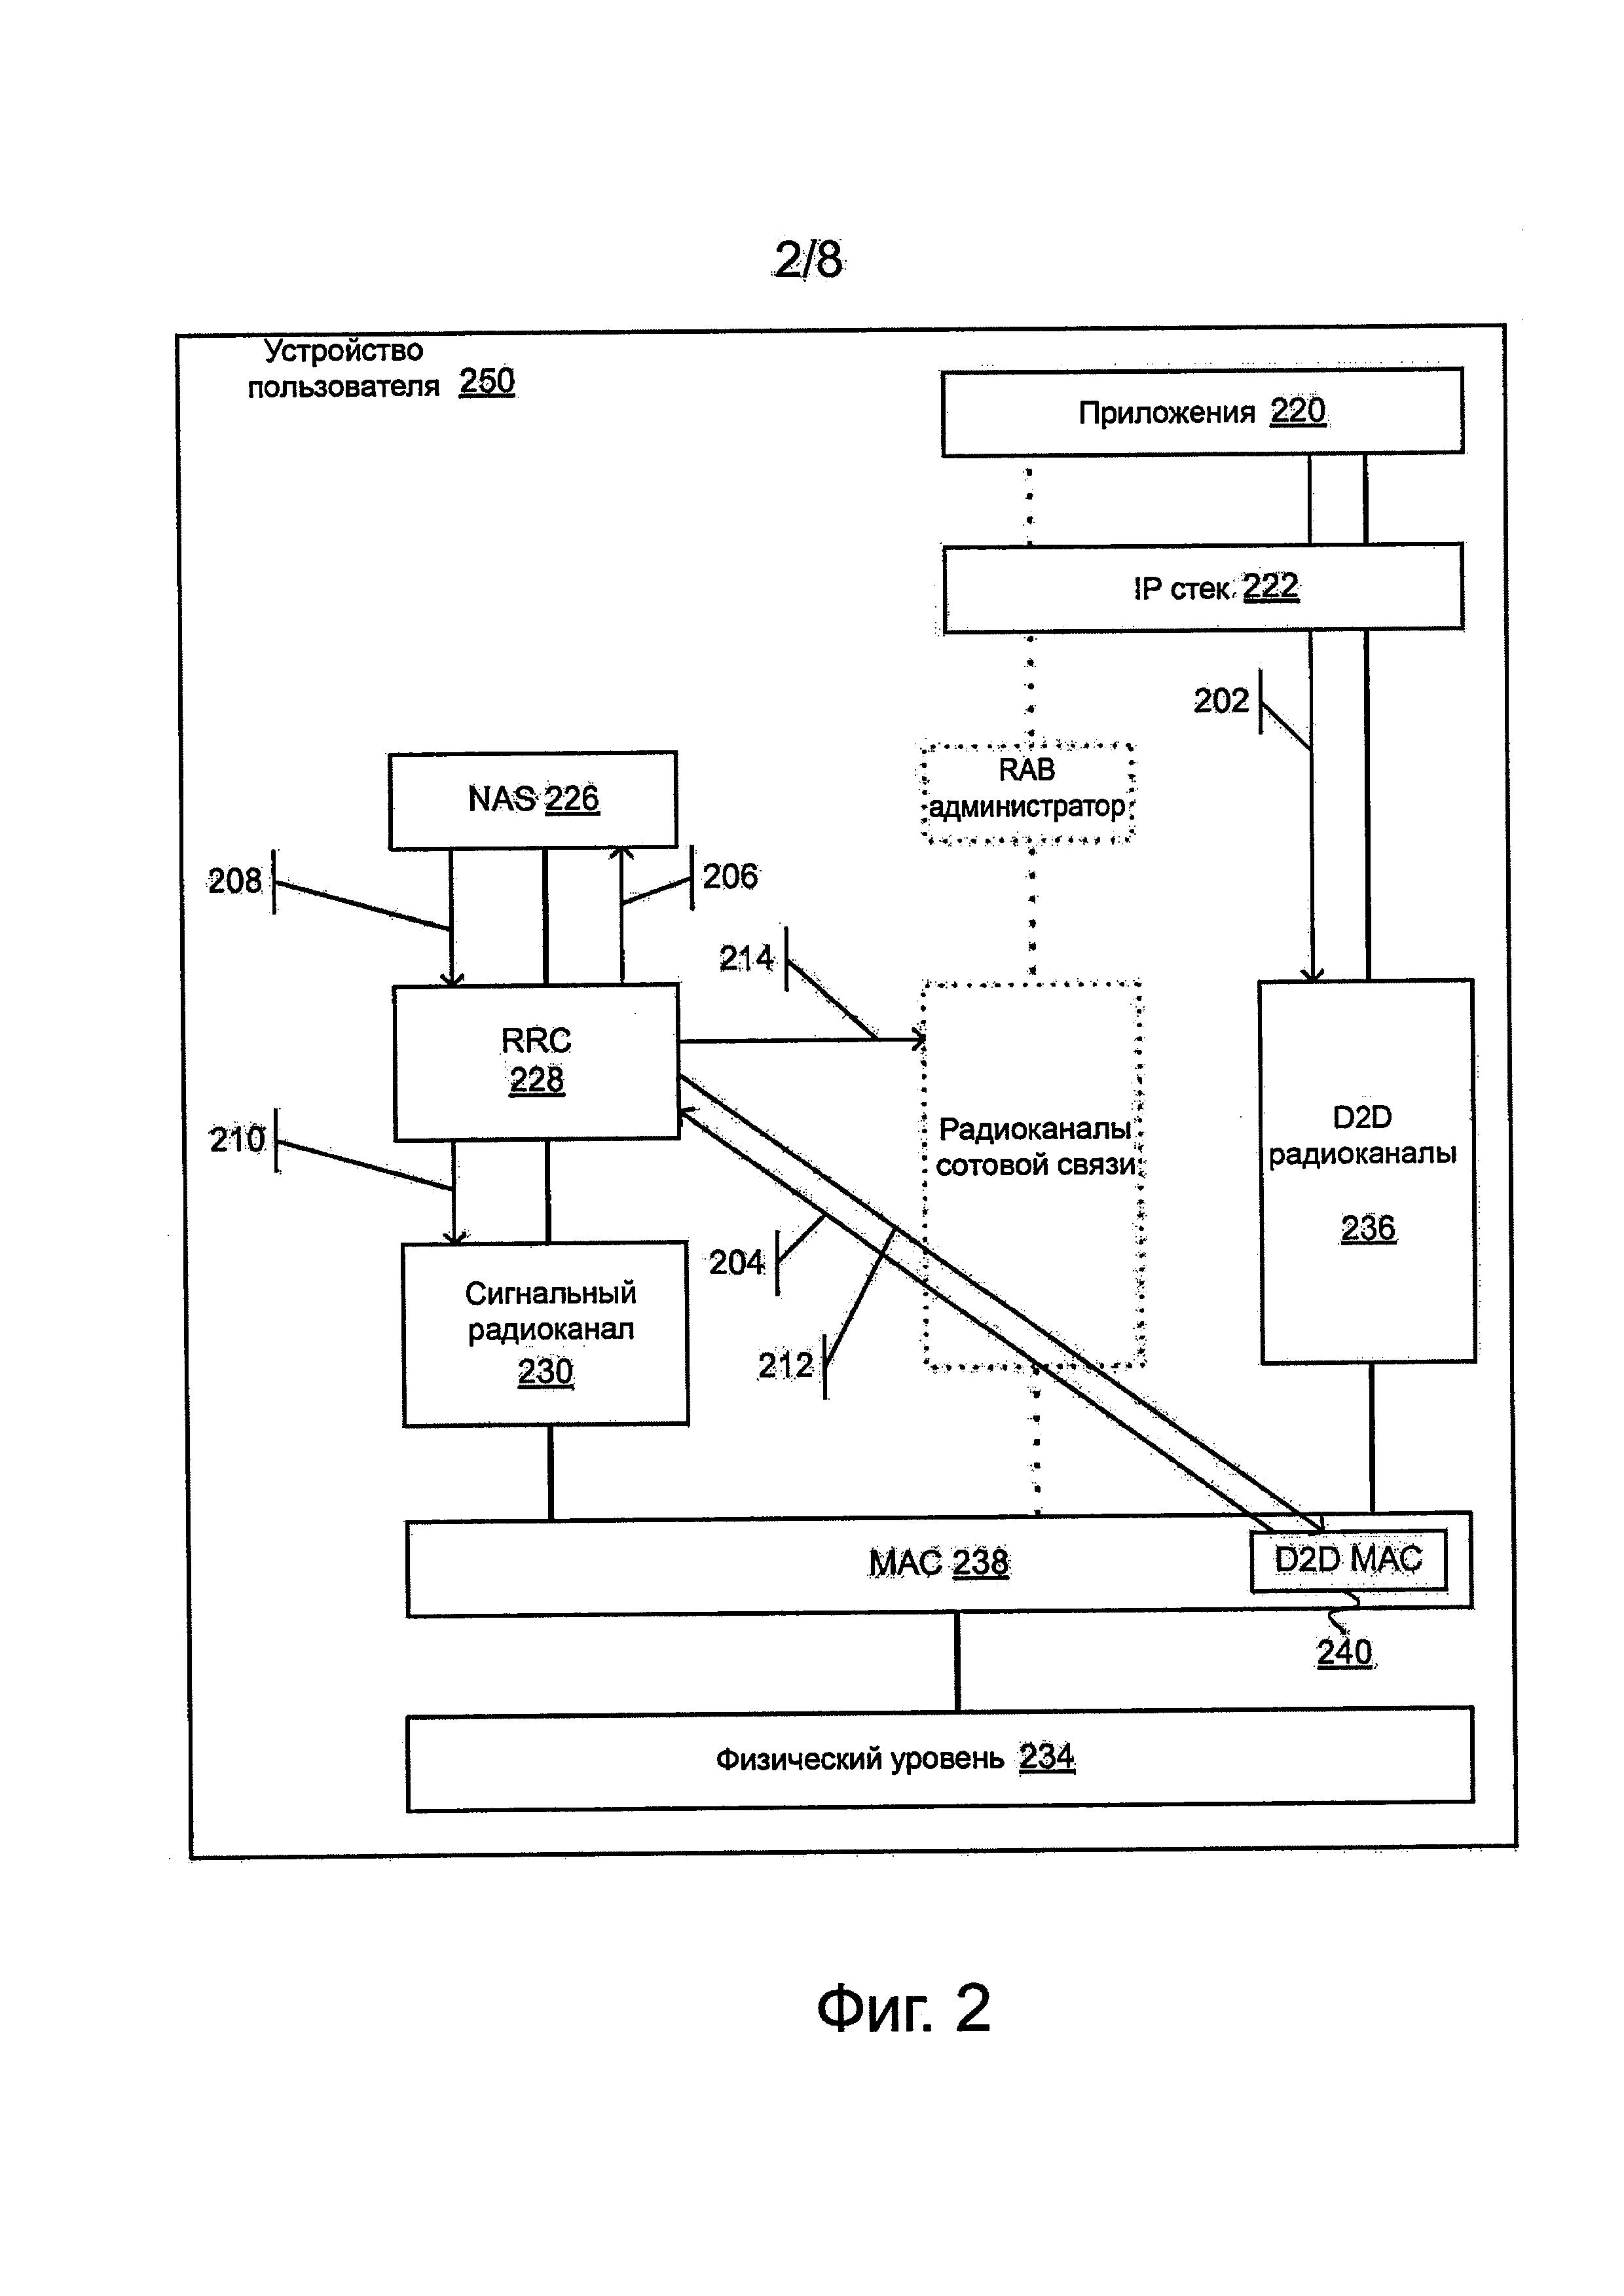 Устройство-устройство (d2d) коммуникации